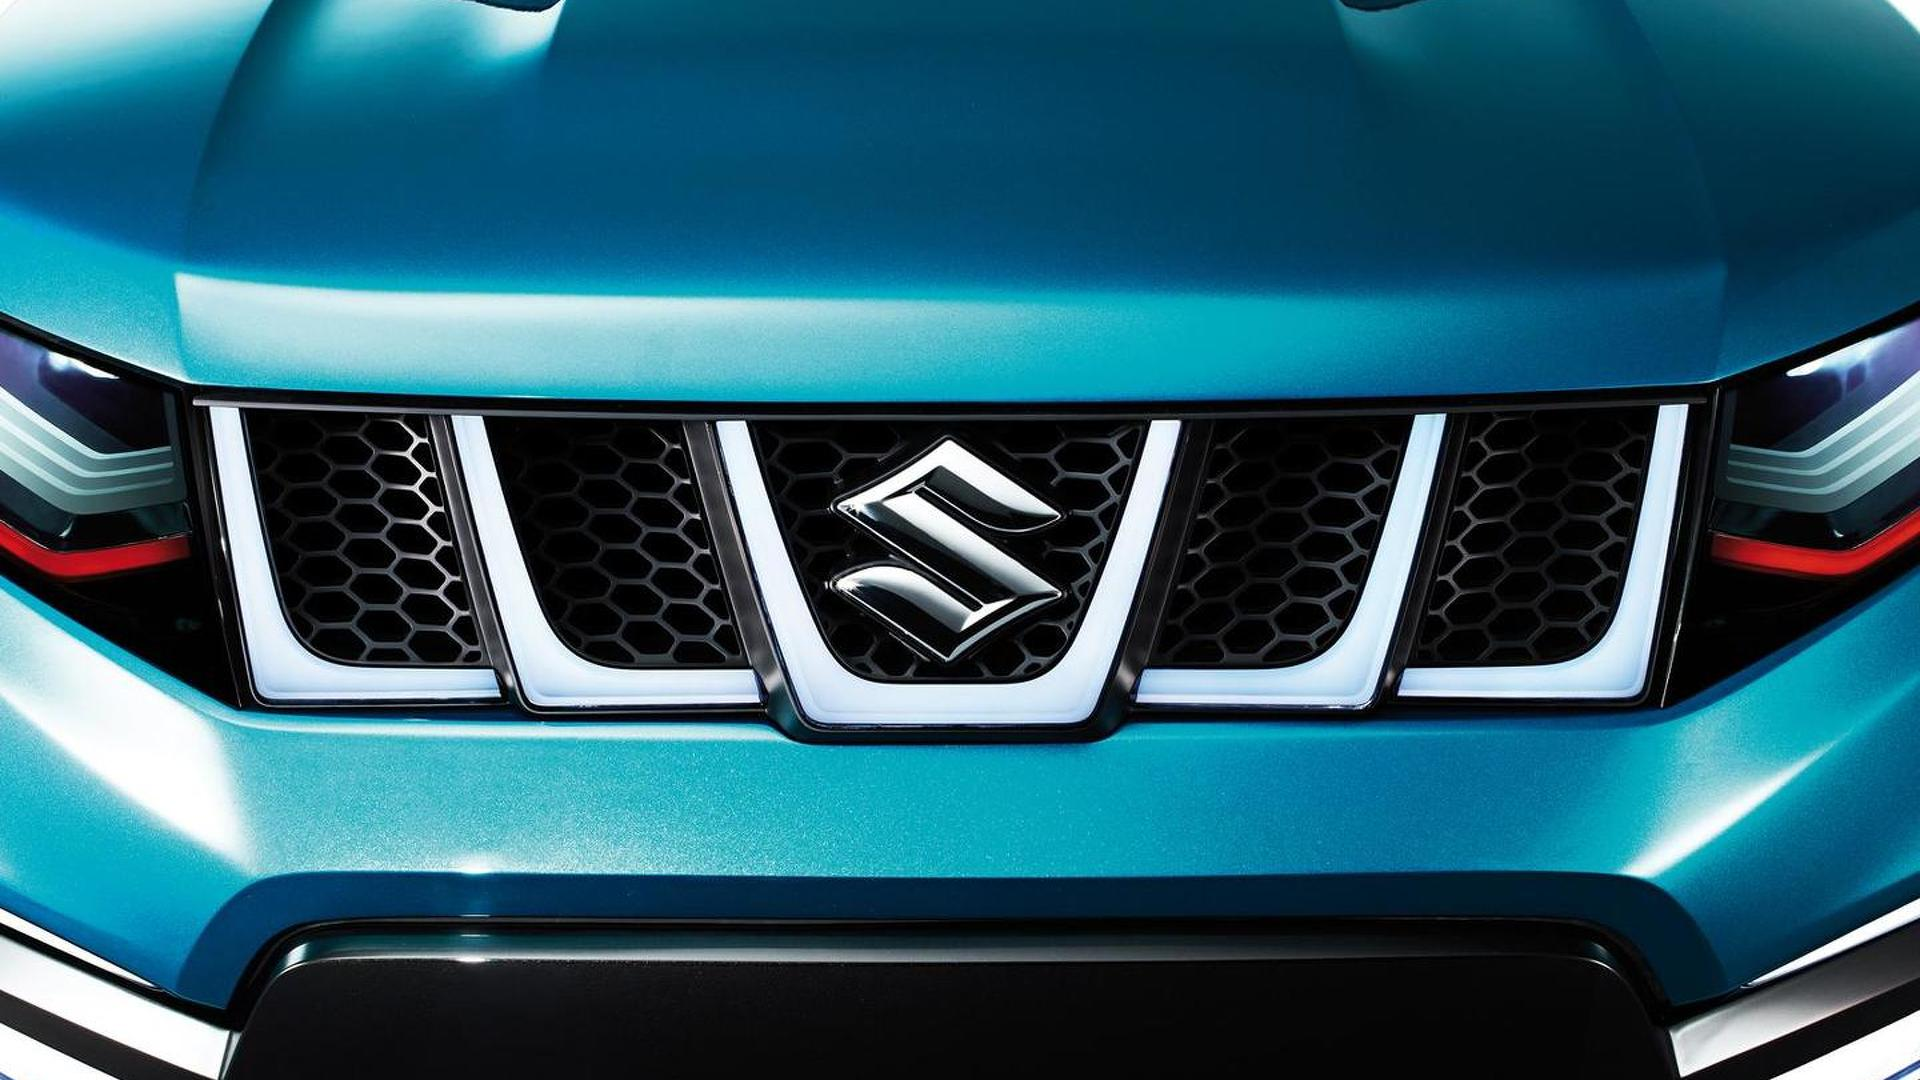 Suzuki caught hiding $3M in income via unused motorcycle parts